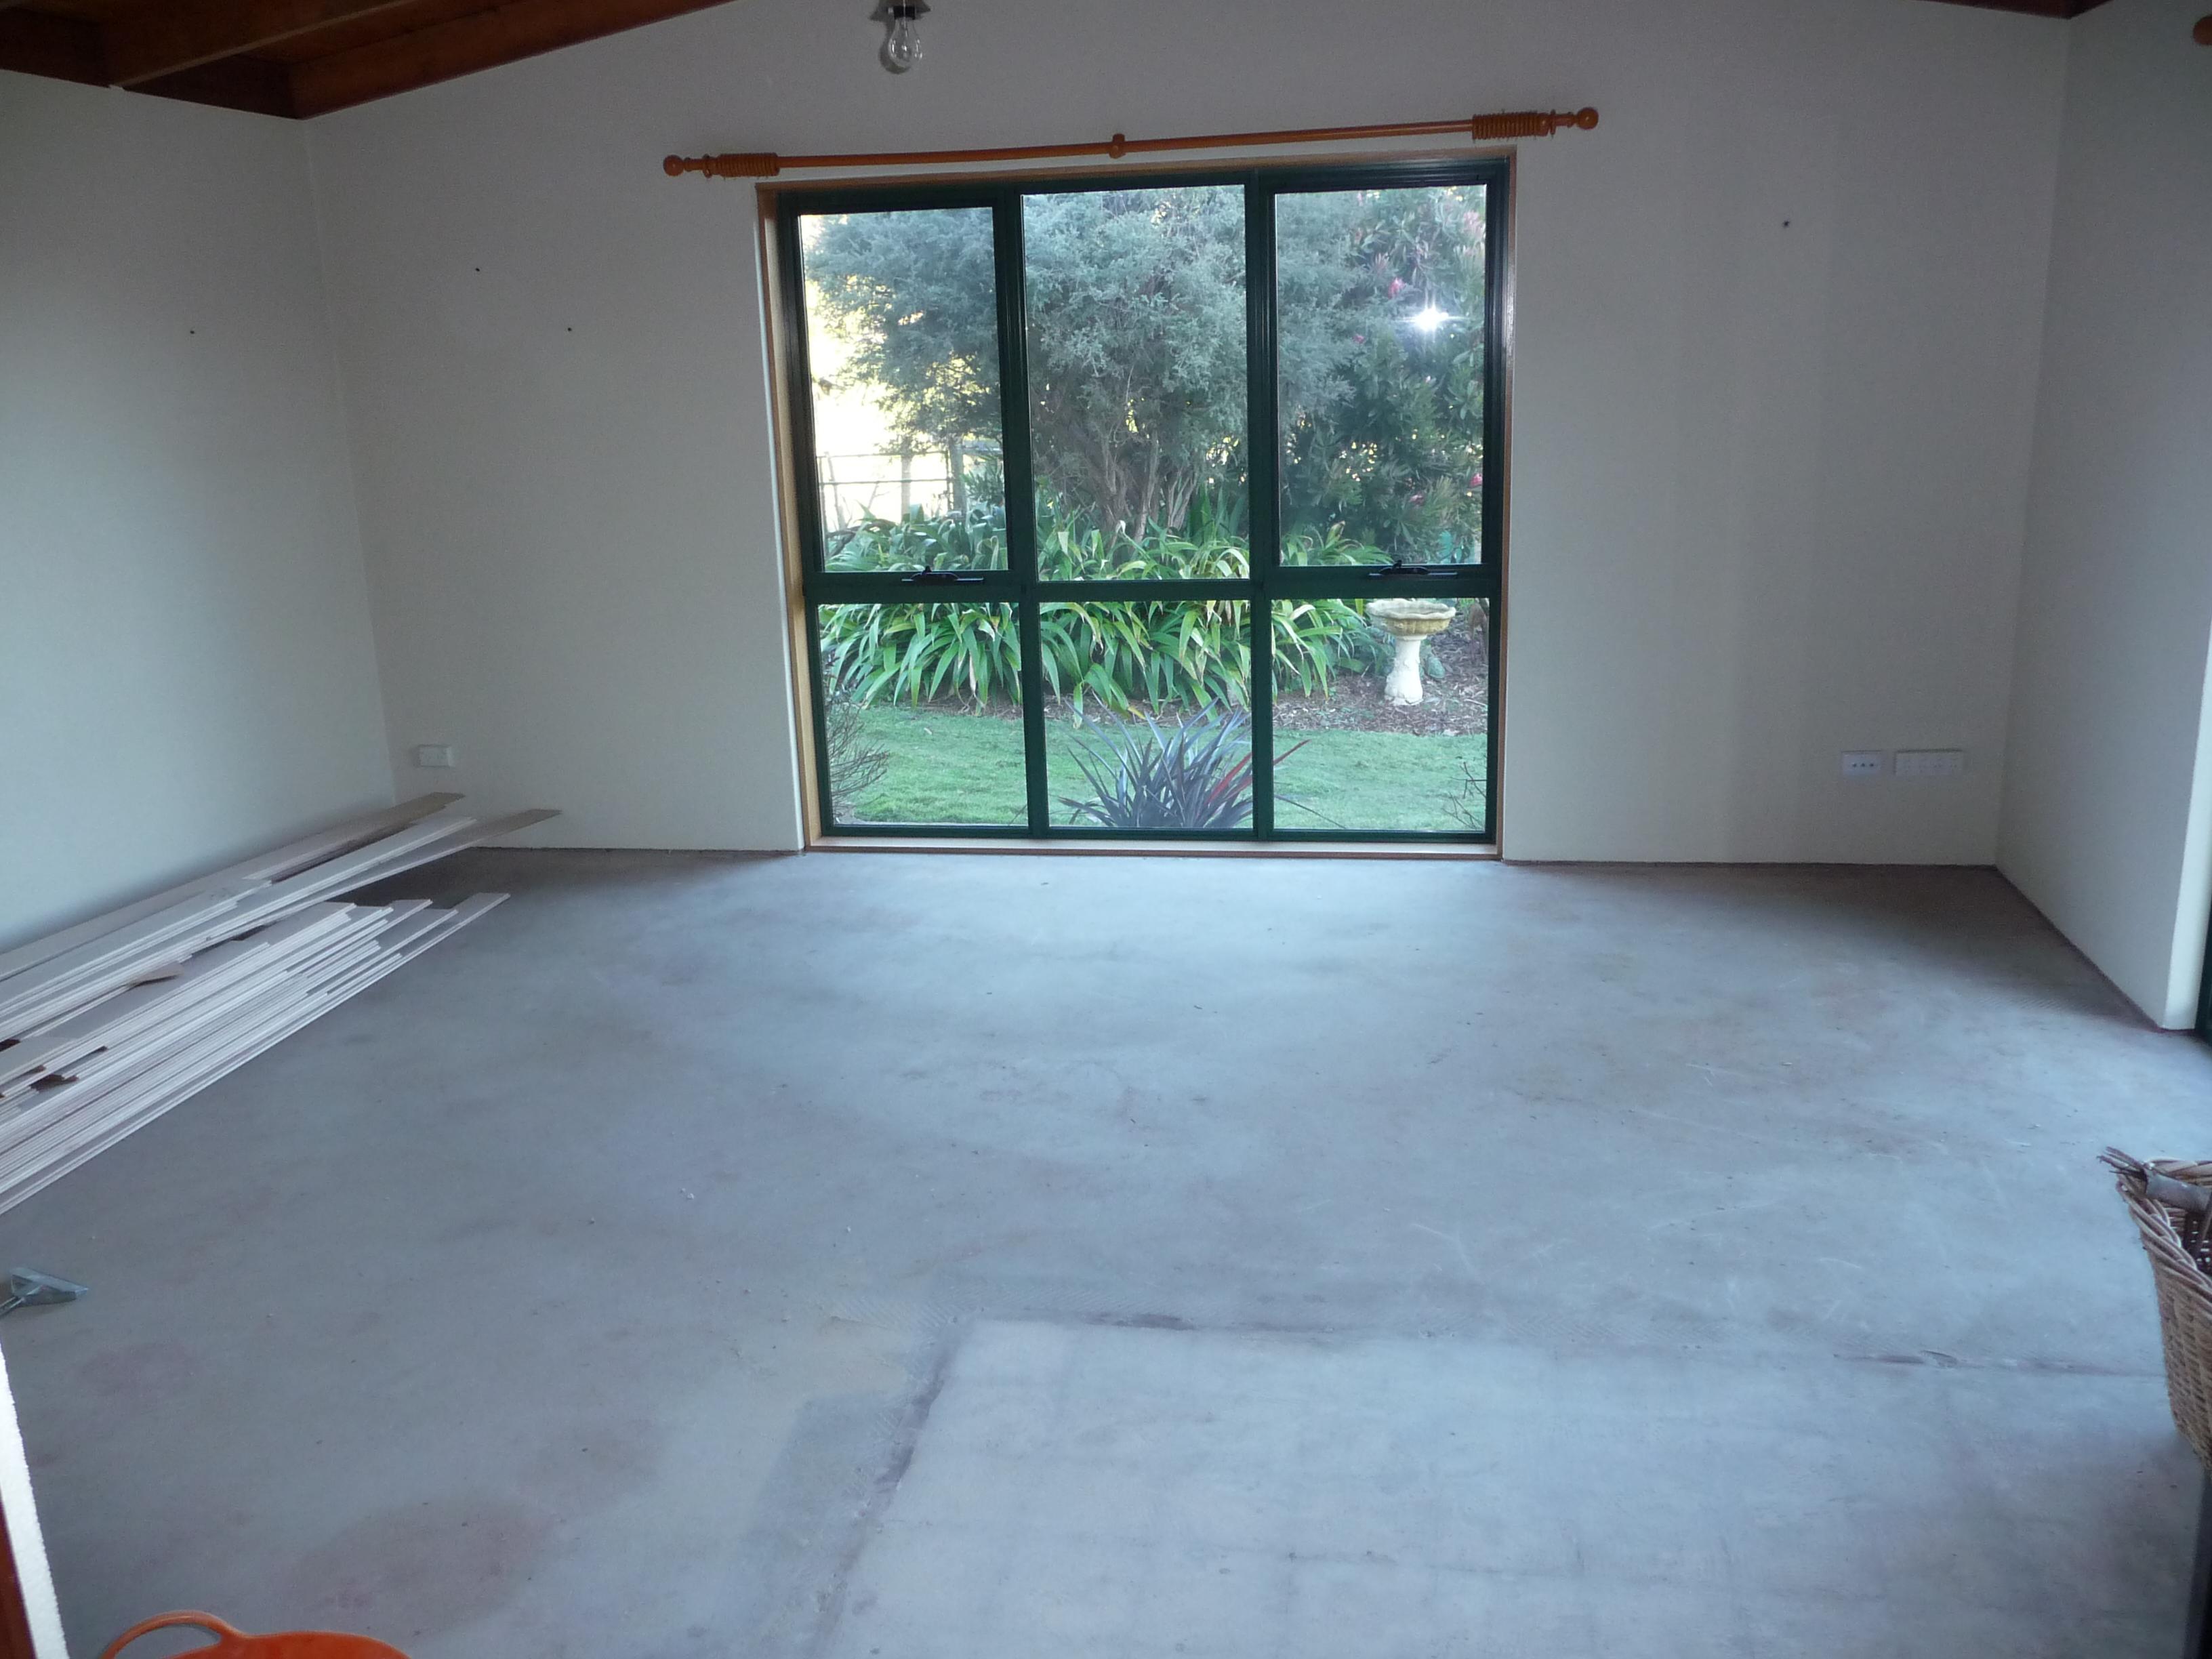 8.stripped floor